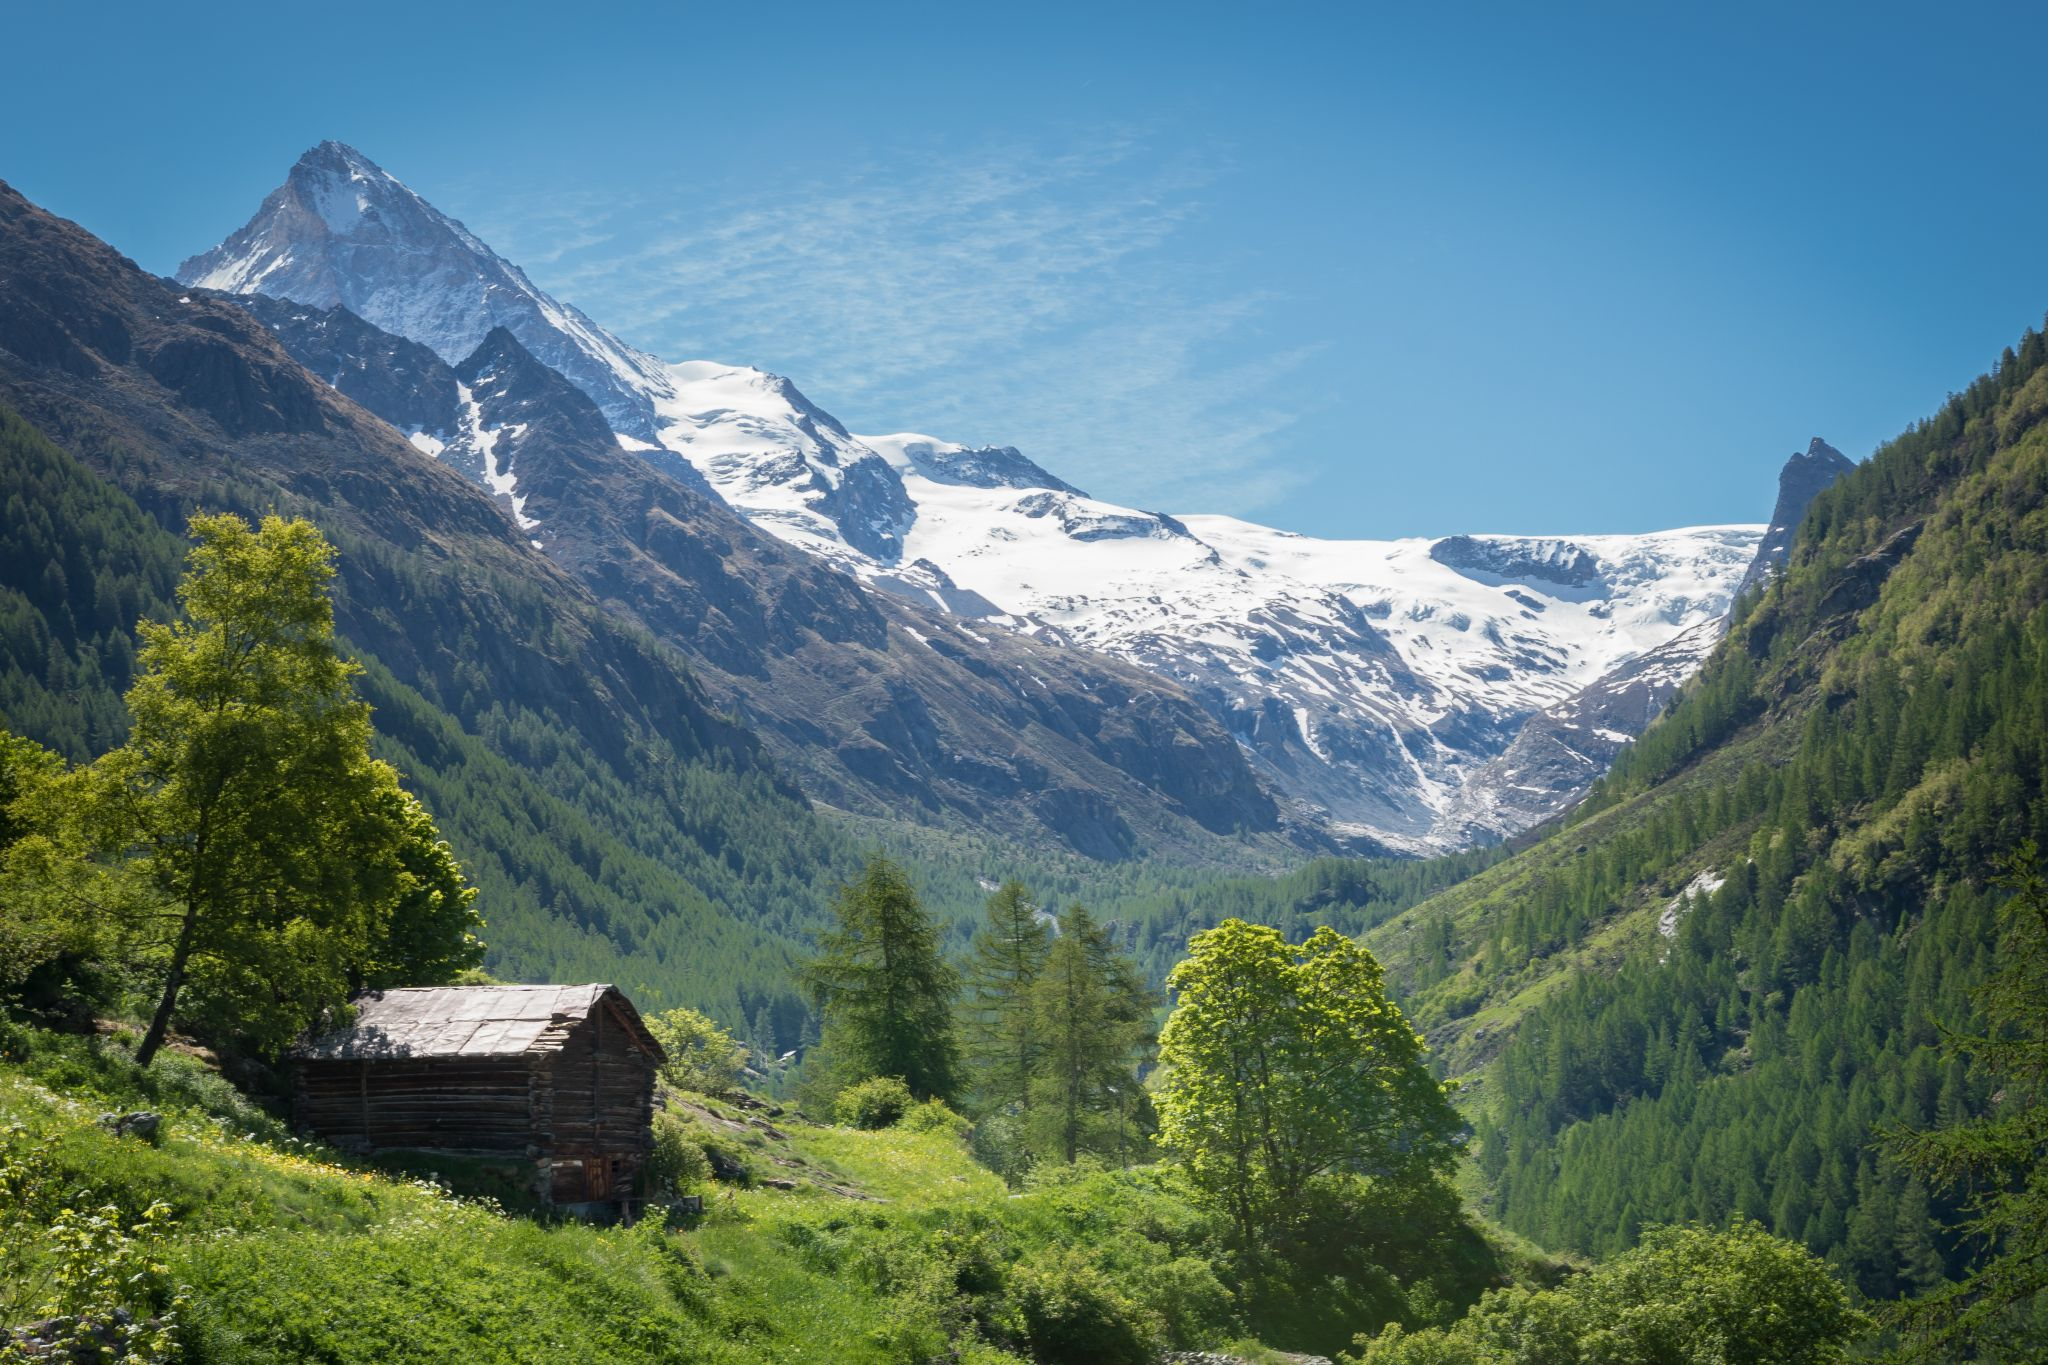 La Forclaz, Seppec, Switzerland